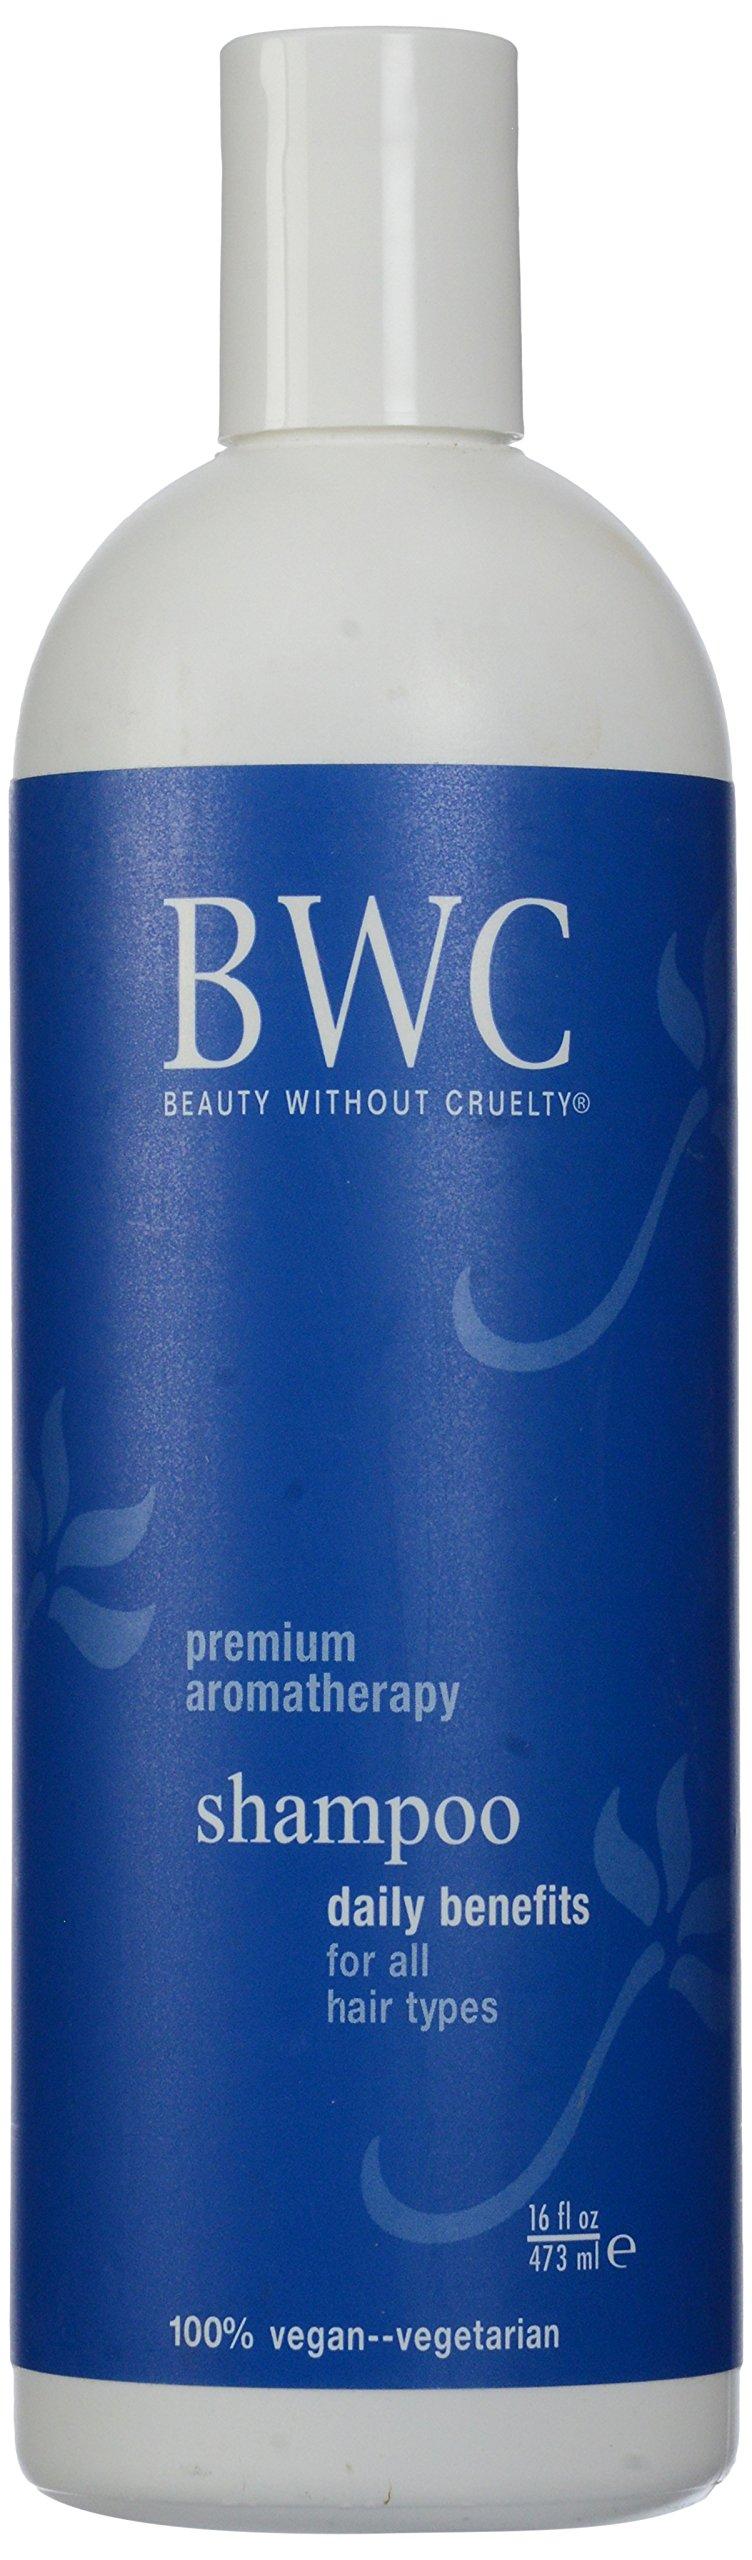 Beauty without Cruelty Daily Benefits Shampoo 16oz